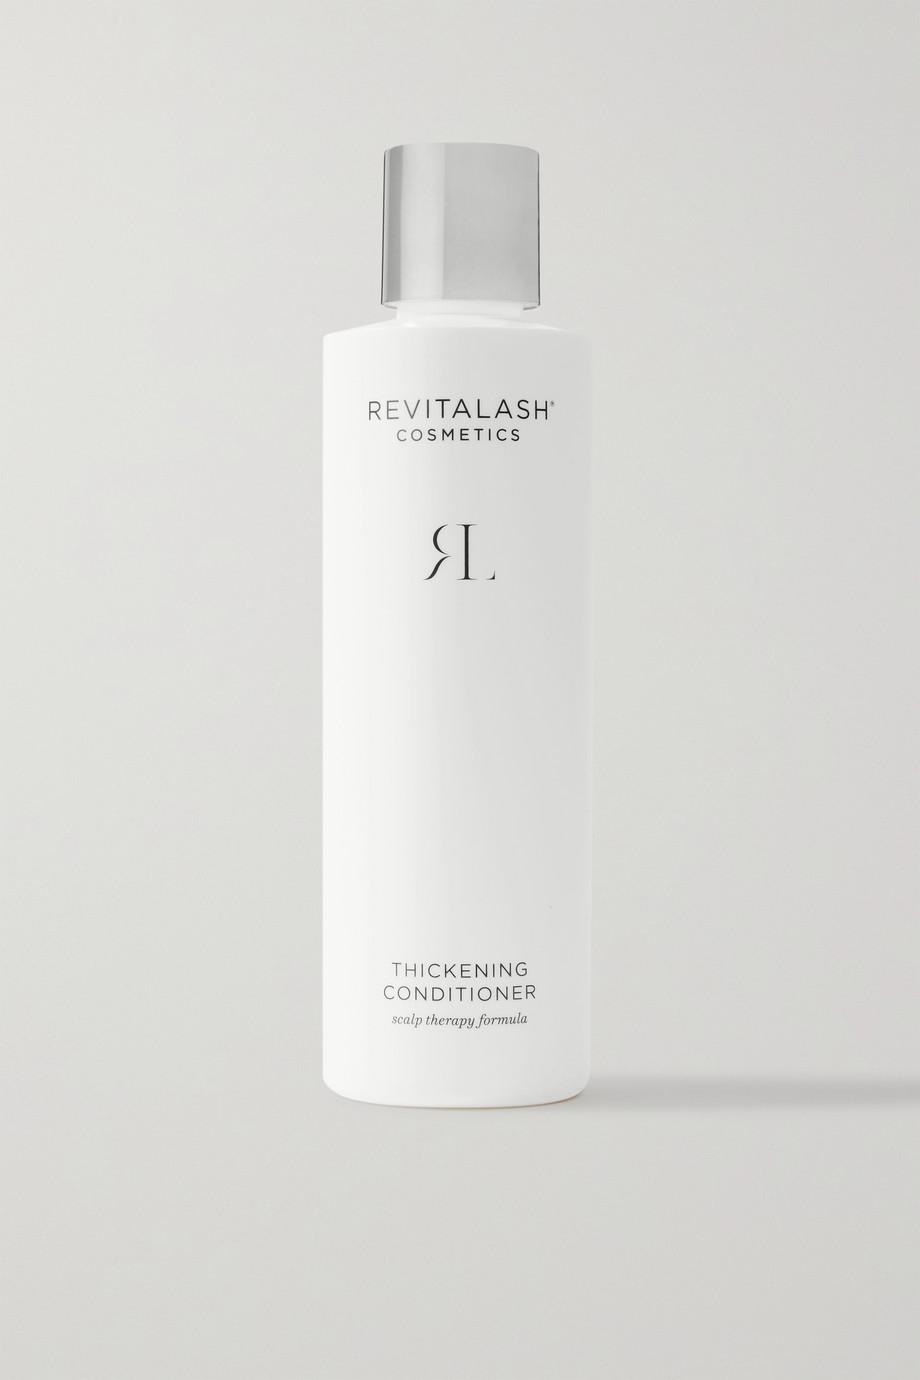 RevitaLash  Thickening Conditioner, 250 ml – Conditioner